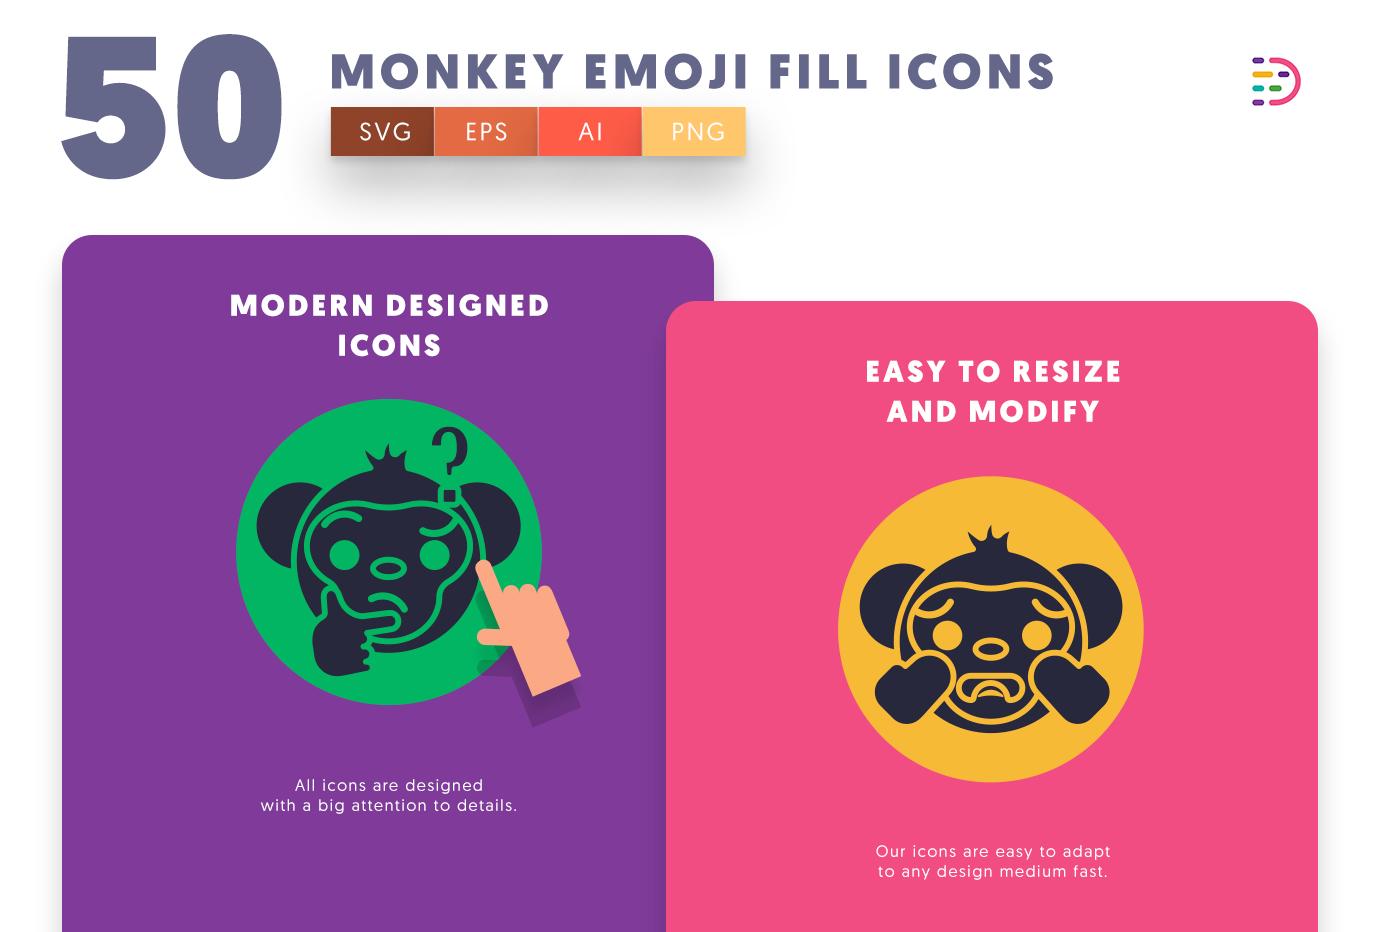 Monkey Emoji Fill icons png/svg/eps